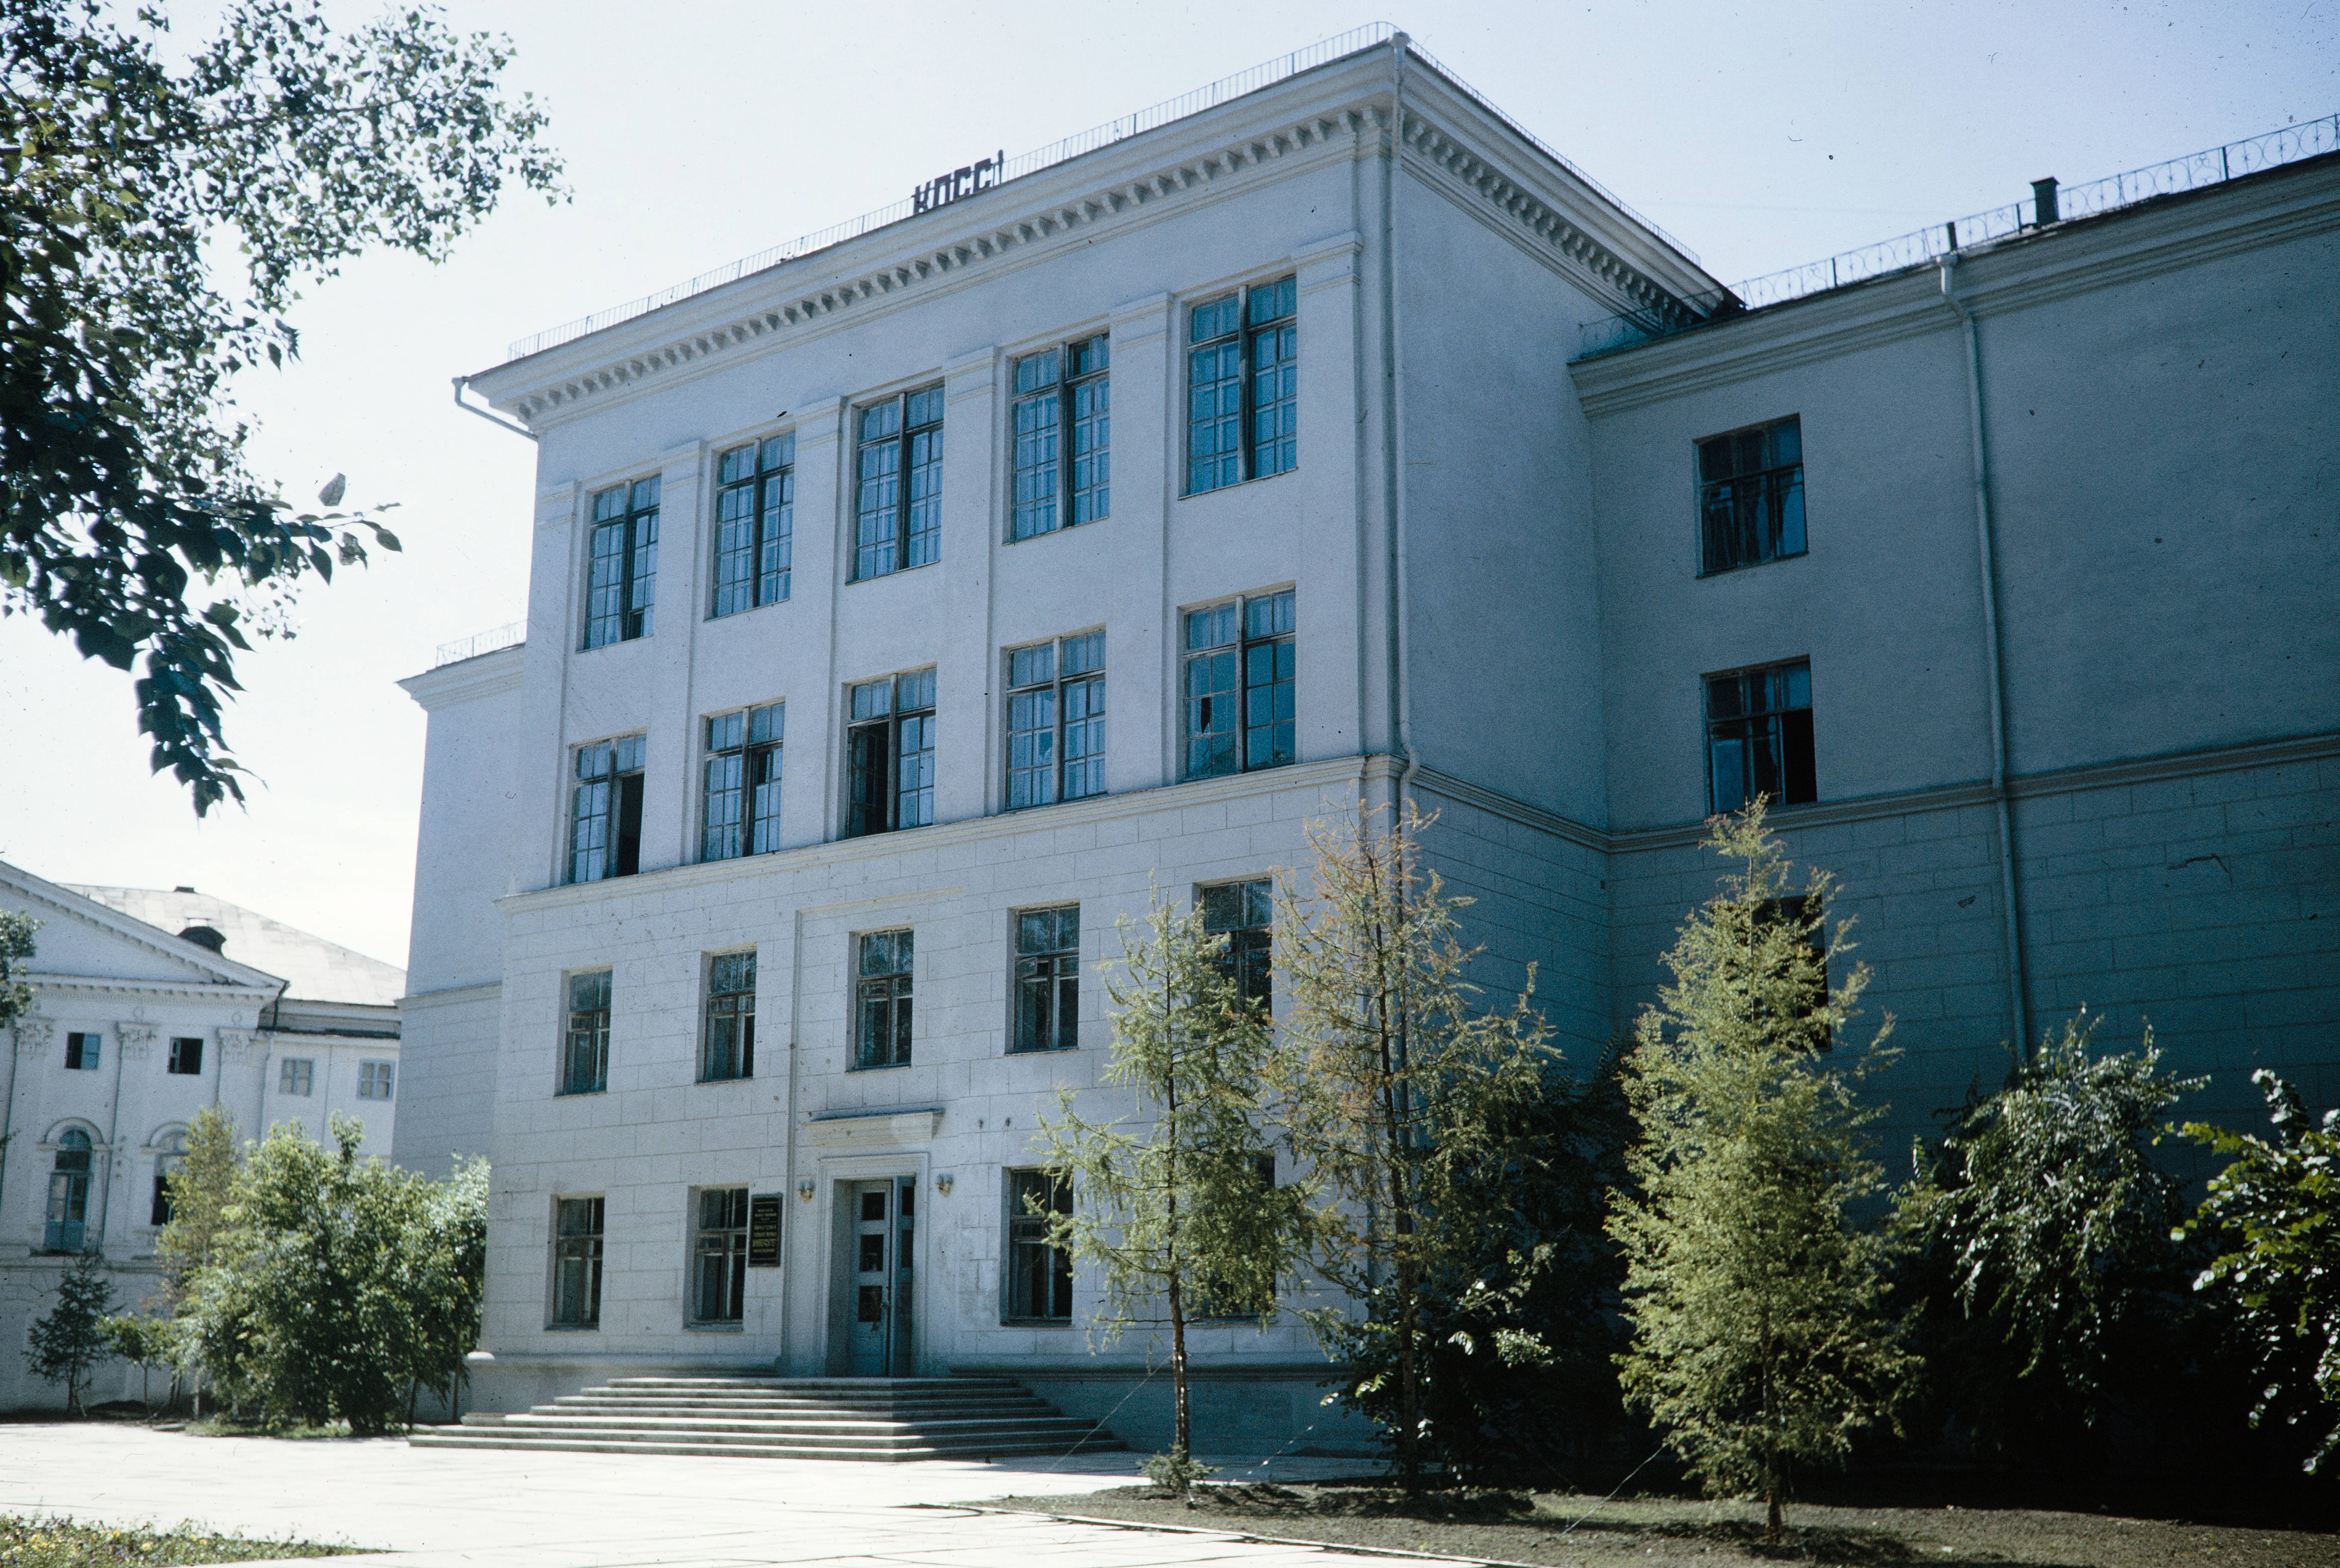 Улица Карла Маркса, 1. Административное здание Иркутского университета